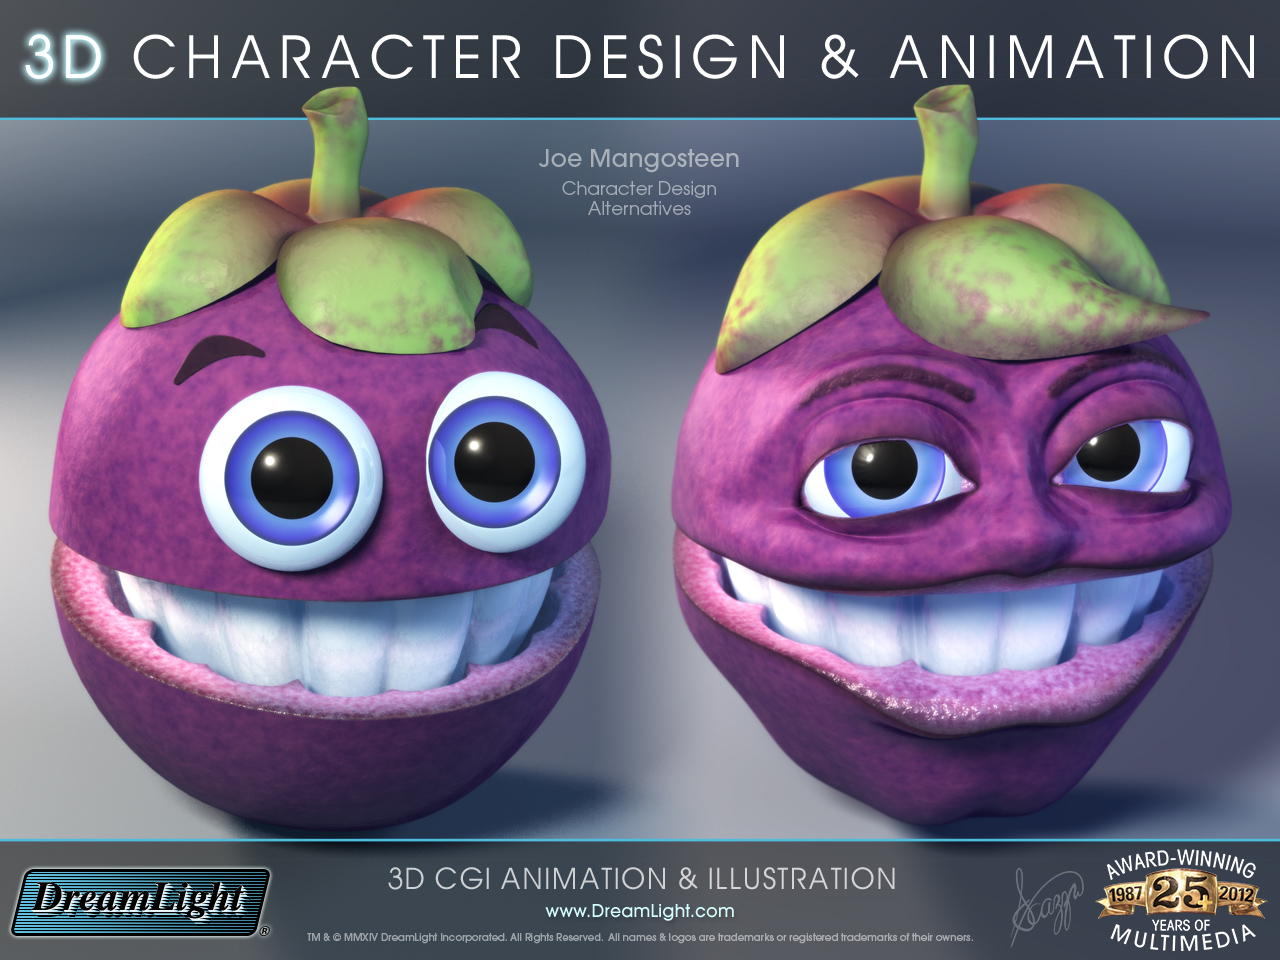 3d Character Design In Illustrator : D character design illustration joe mangosteen